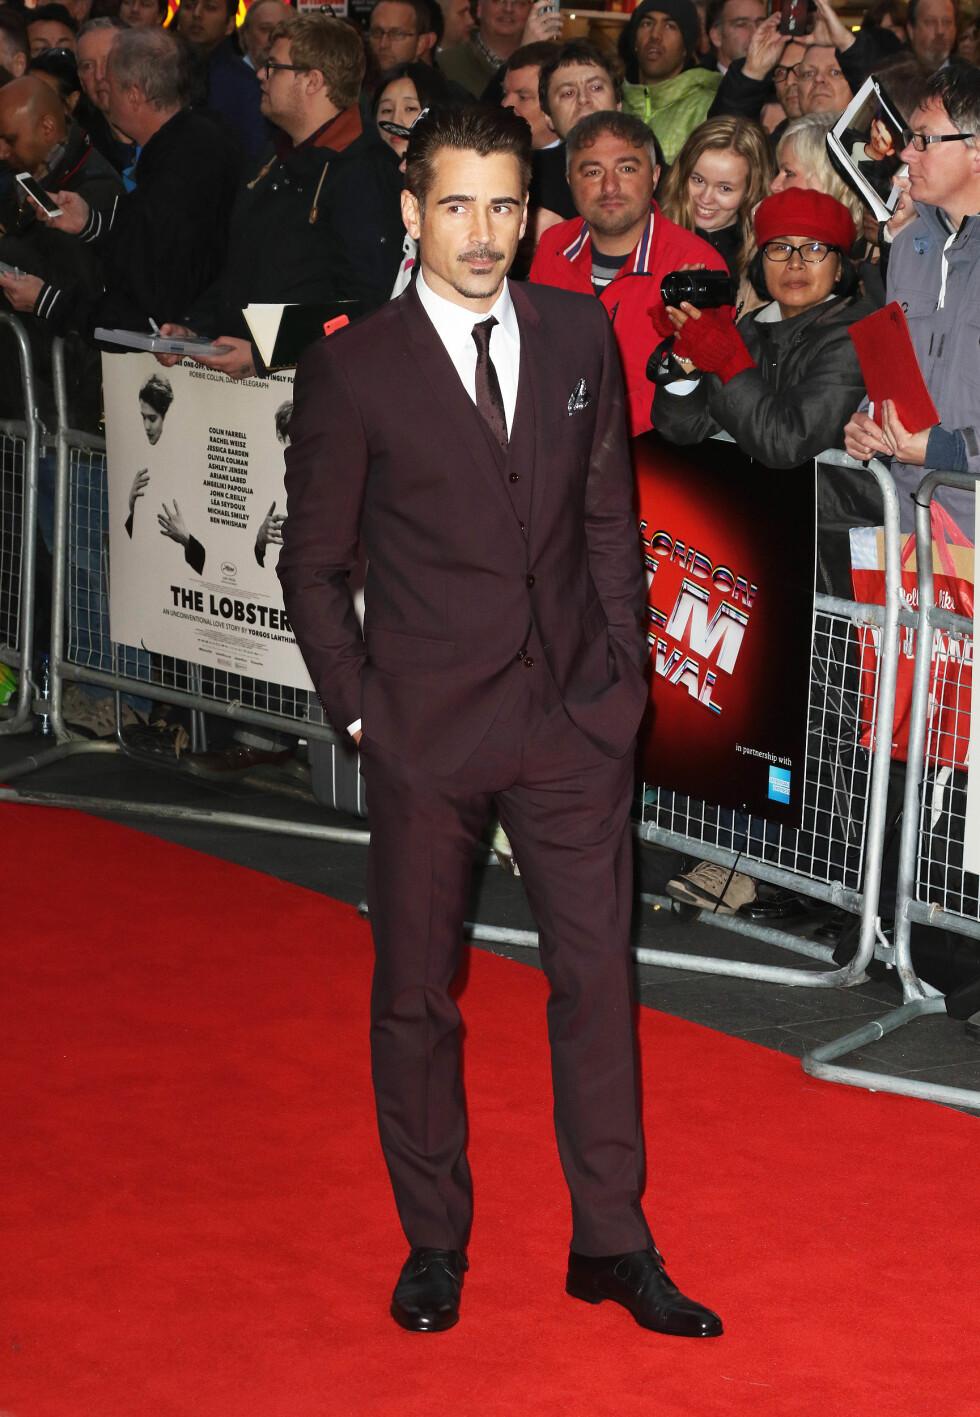 I BRUNT: «True Detective»-stjernen Colin Farrell i en burgunderfarget dress og matchende slips på «The Lobster»-visningen under BFI London Film Festival den 13. oktober. Foto: Zuma Press